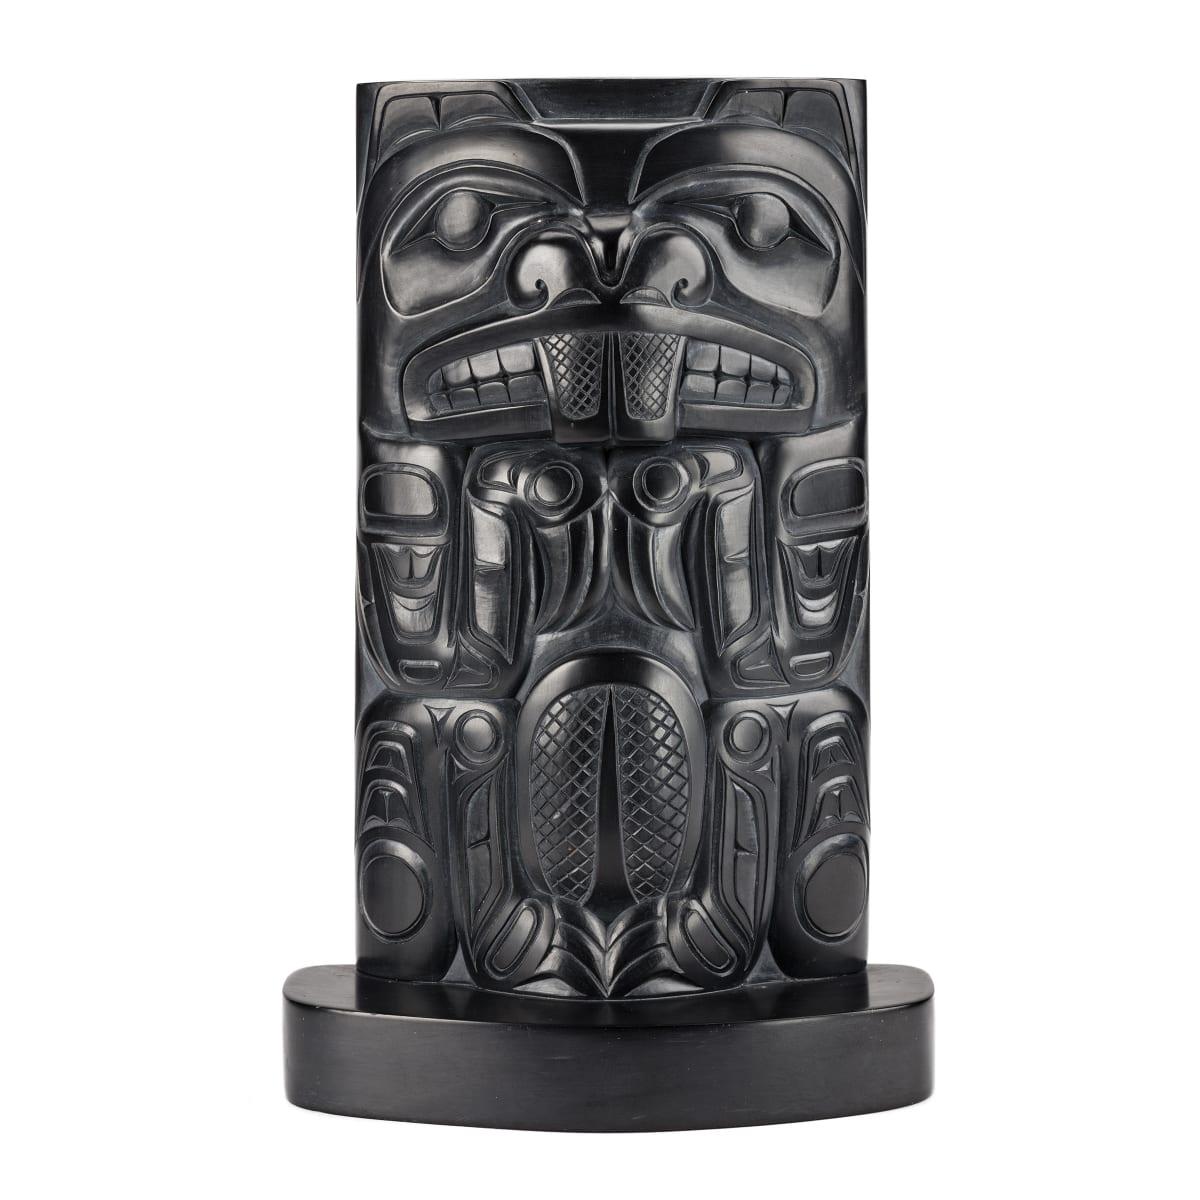 GARNER MOODY (1958-), HAIDA, SKIDEGATE Totemtic Figure, 1985 REALIZED: $2,160